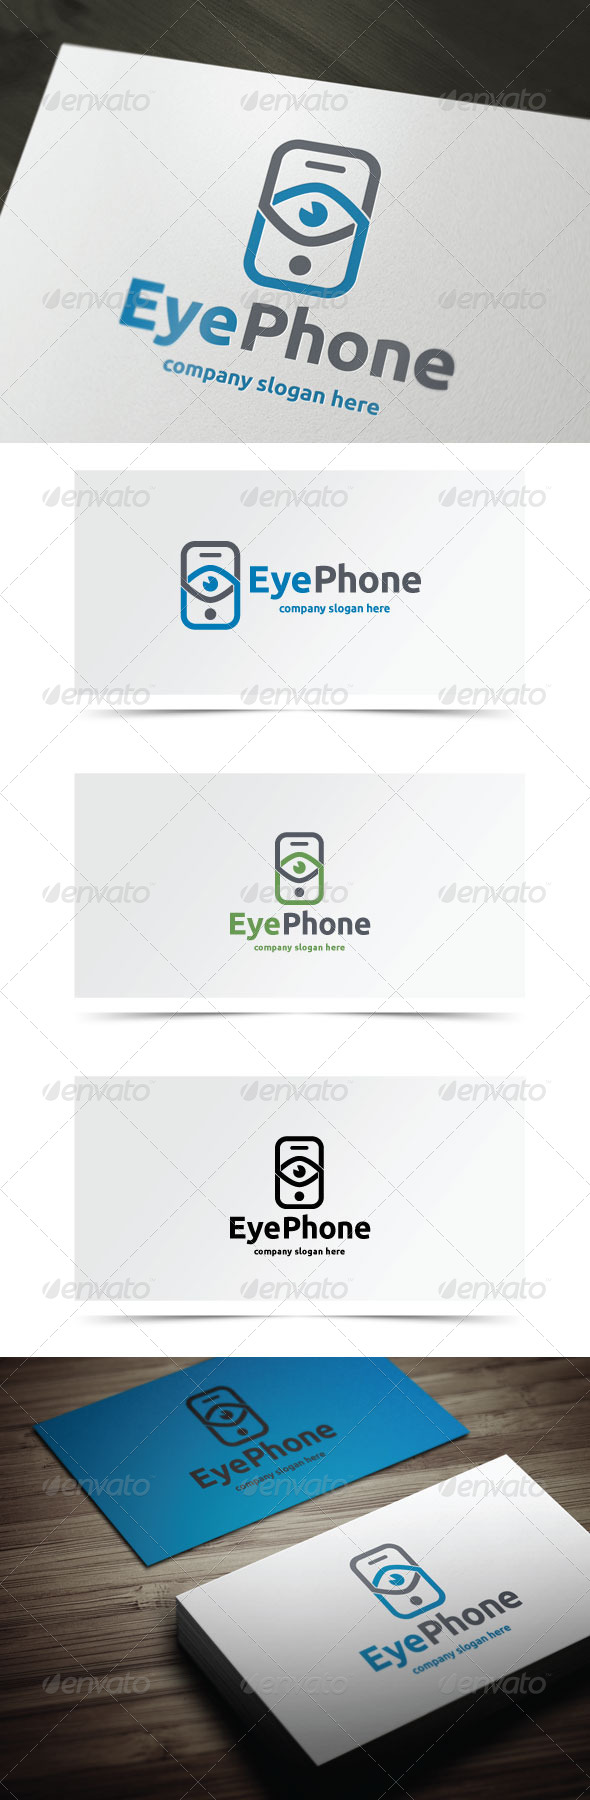 GraphicRiver Eye Phone 6828695